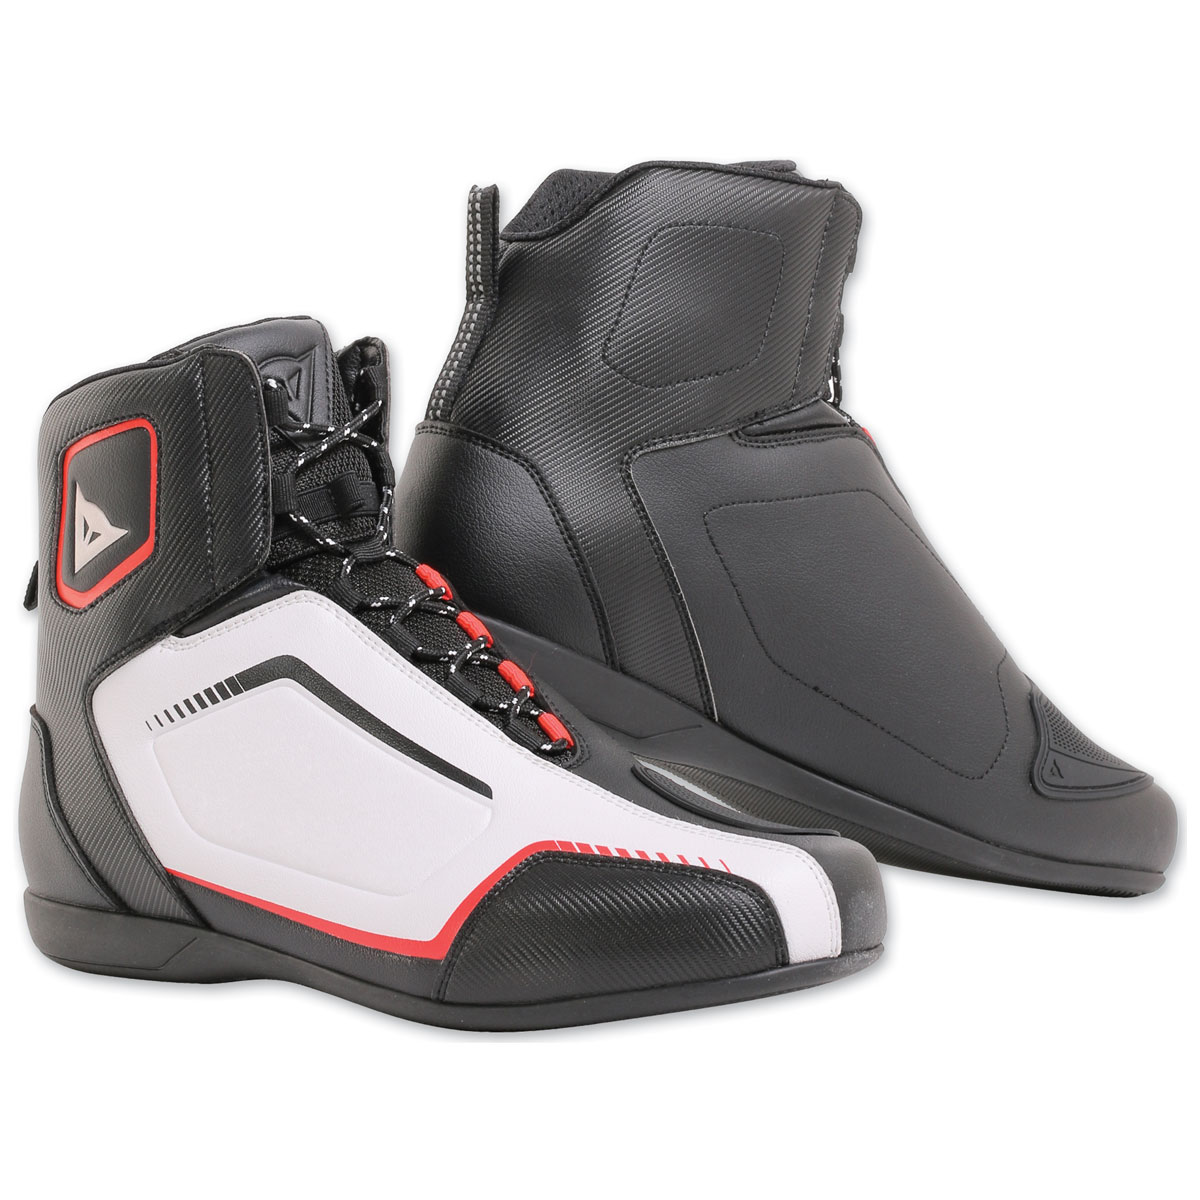 Dainese Men's Raptors Air Black/White/Red-Lava Shoes